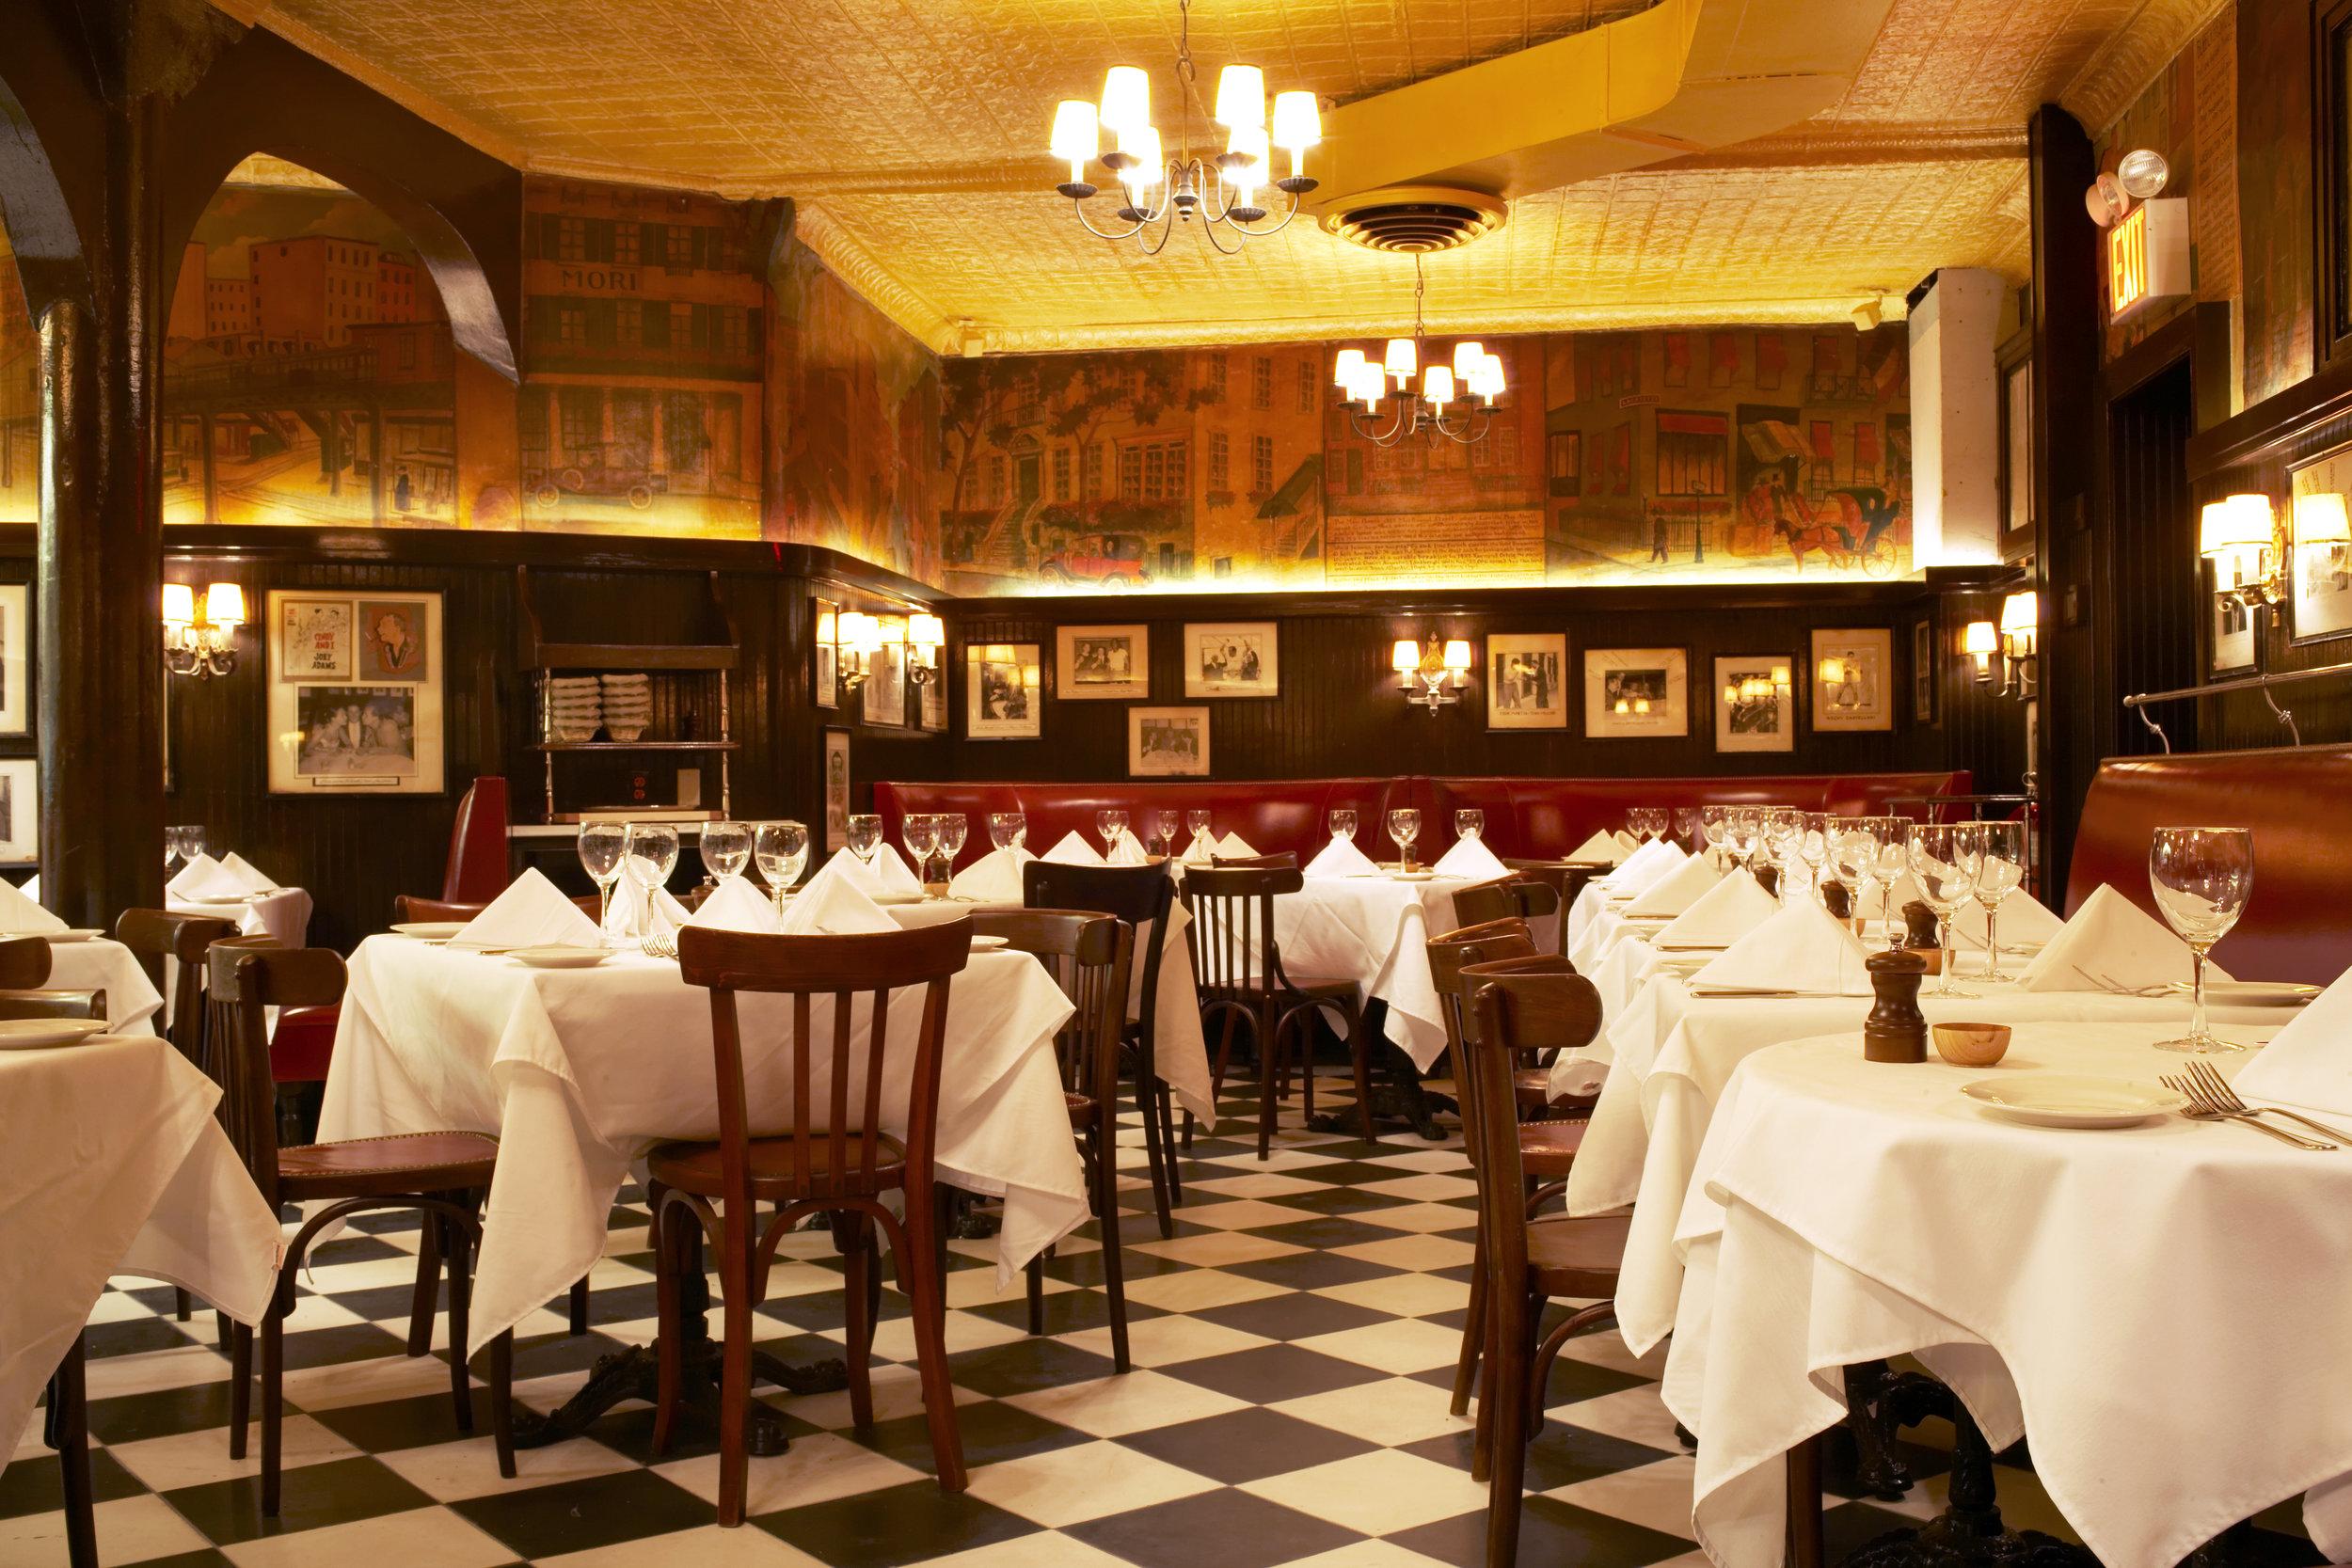 MinettaTavern_Dining Room Booths & Tables_Ngoc Ngo.jpg